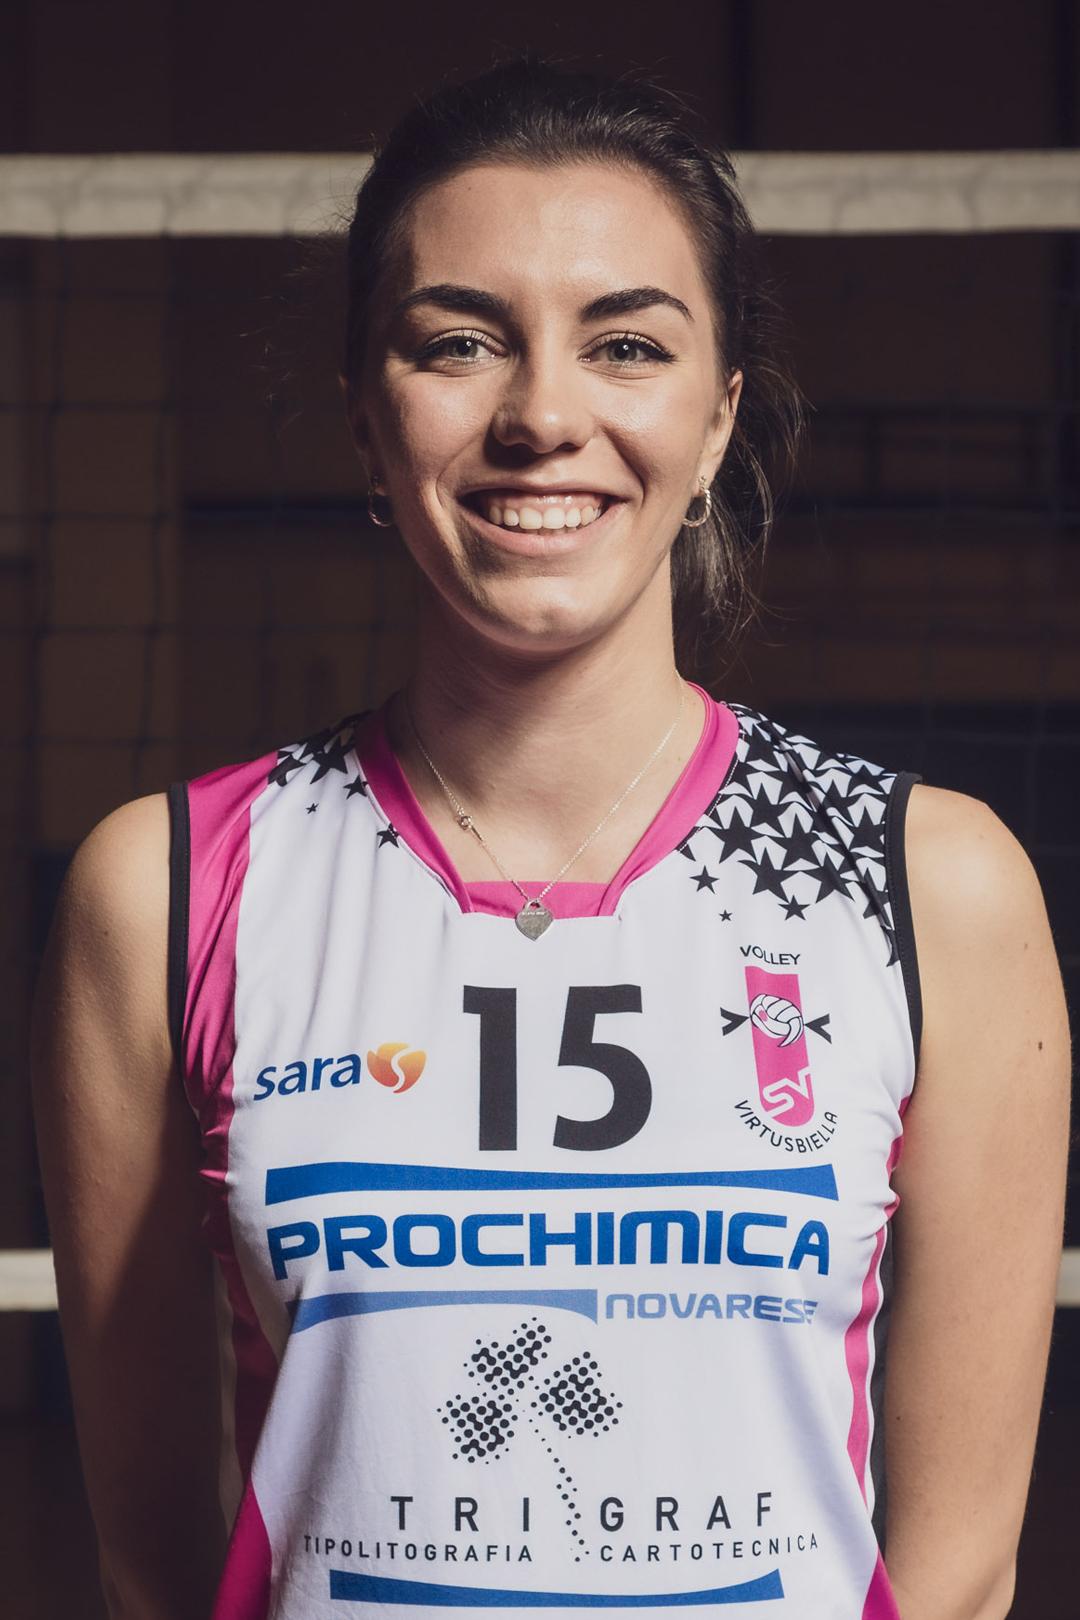 15 – Irene Zecchini